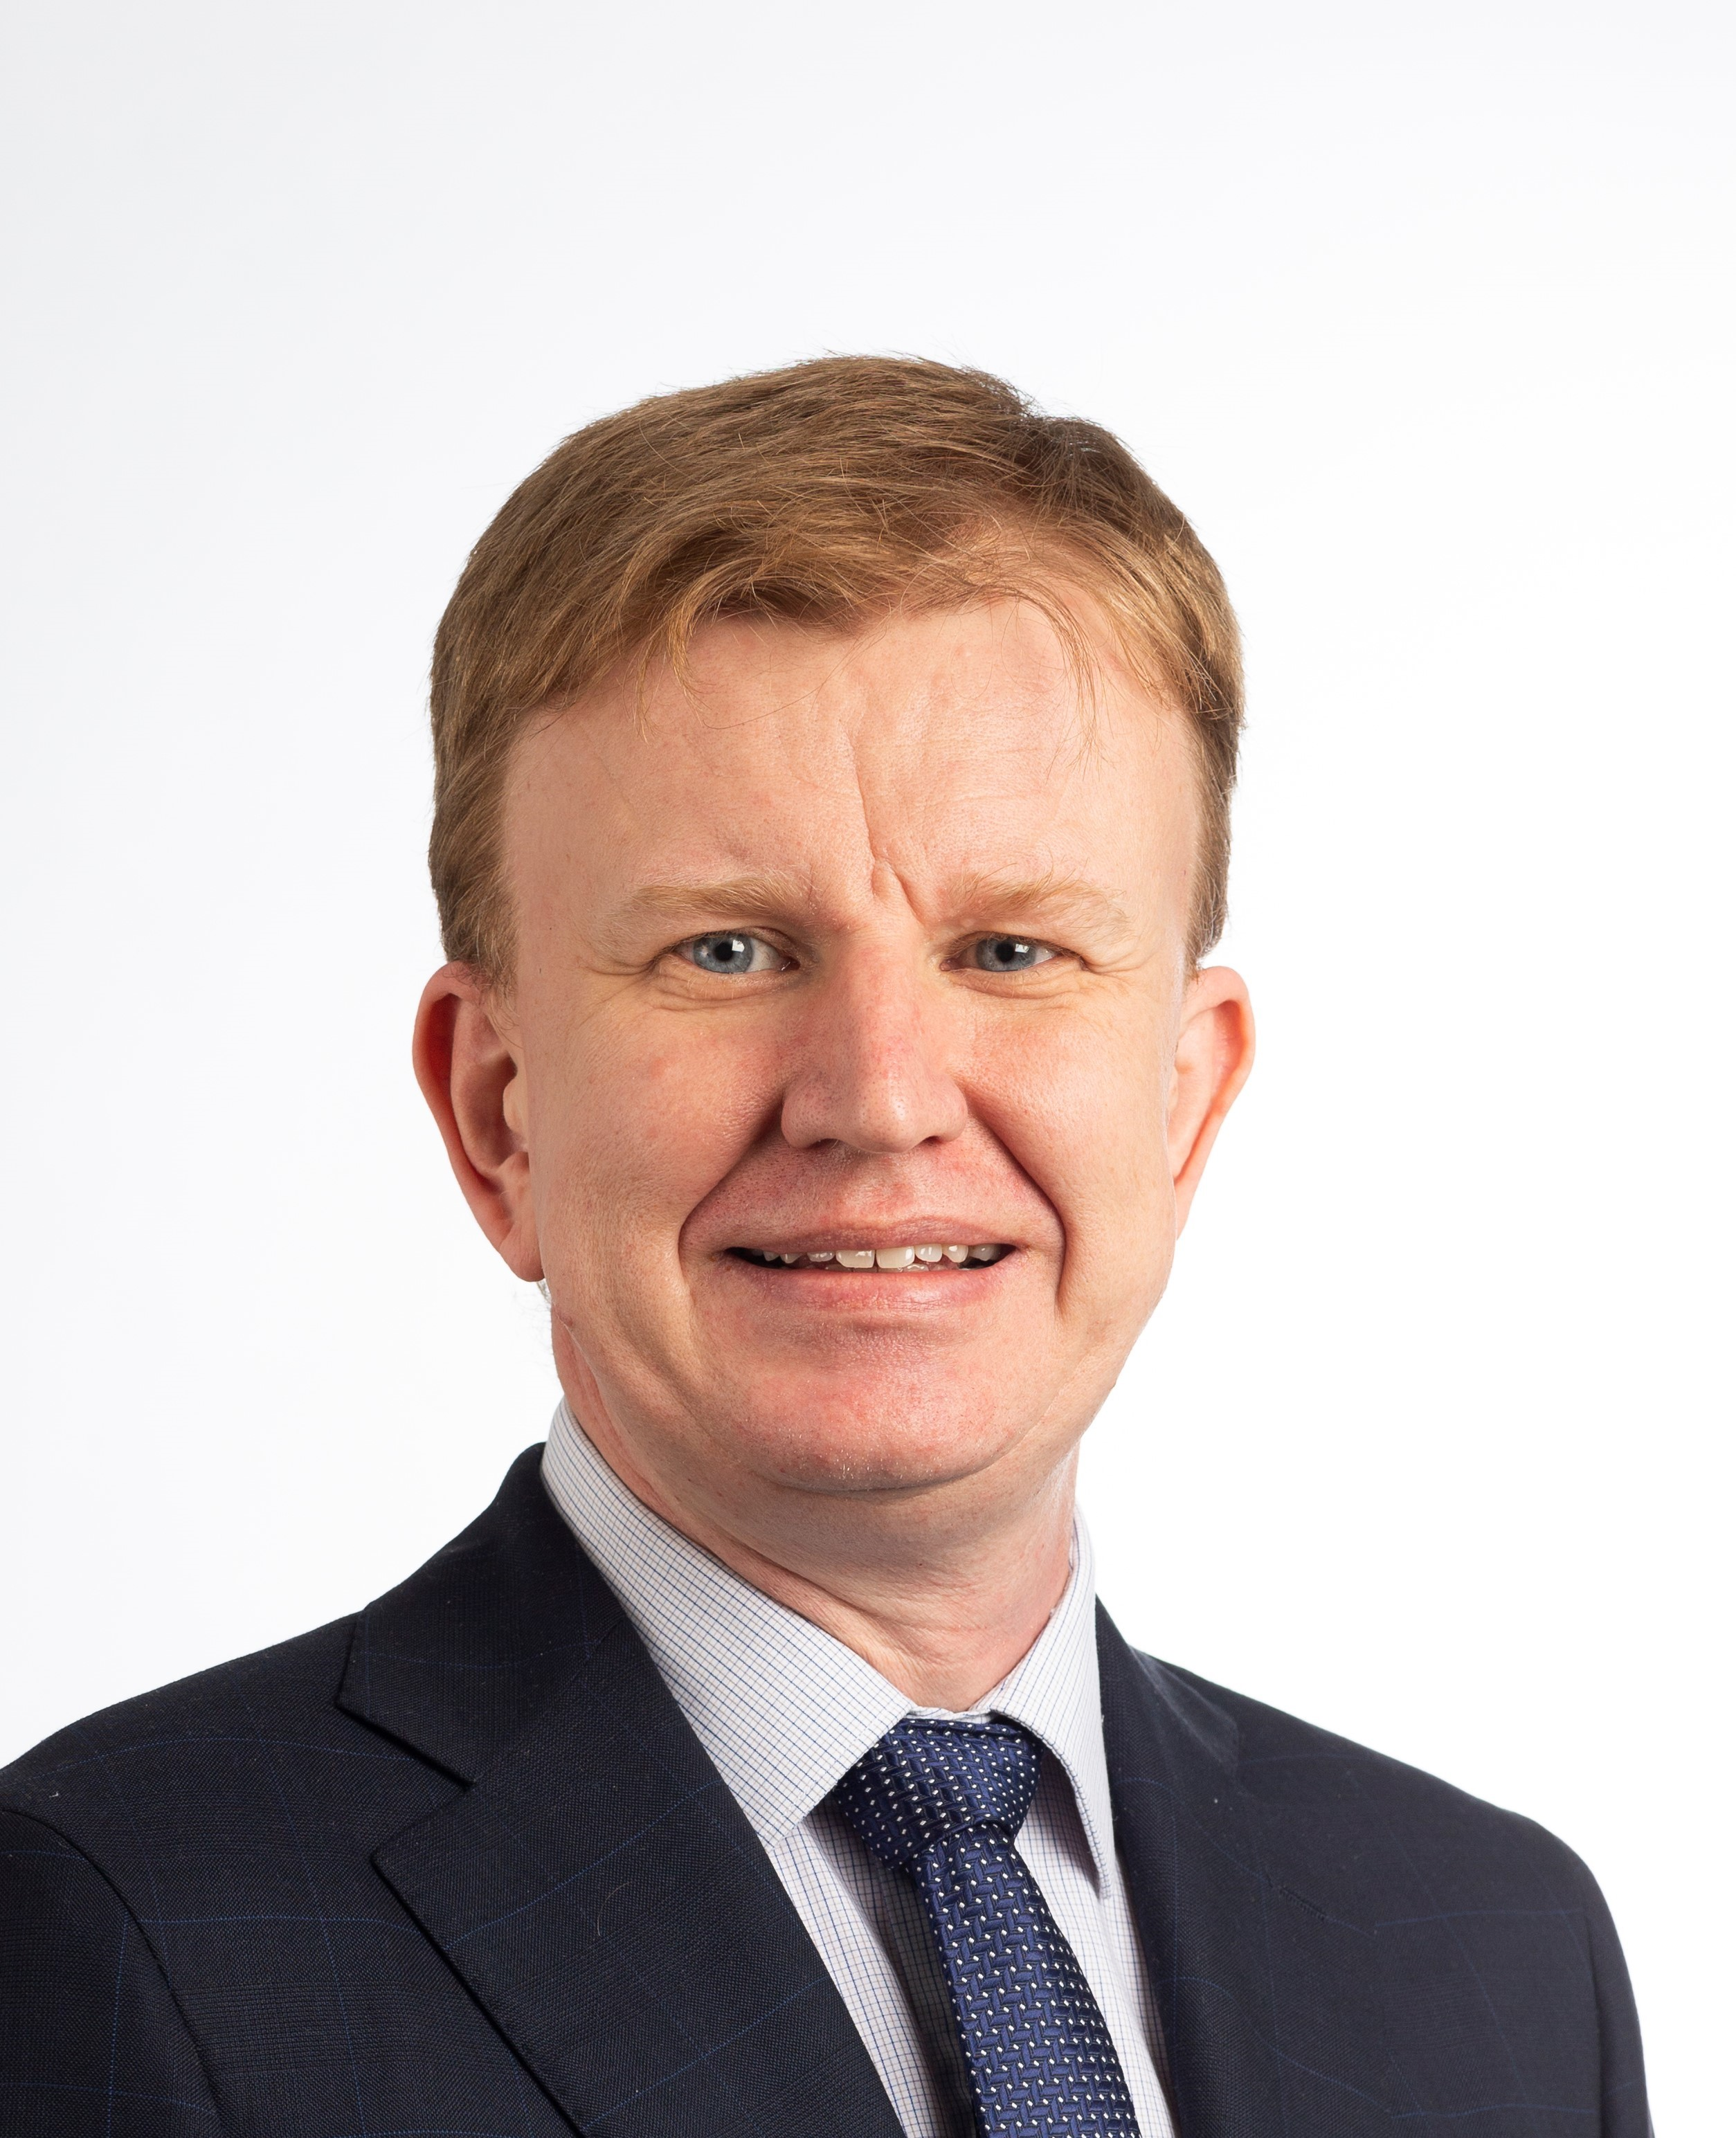 Dr Christopher Martin Standen